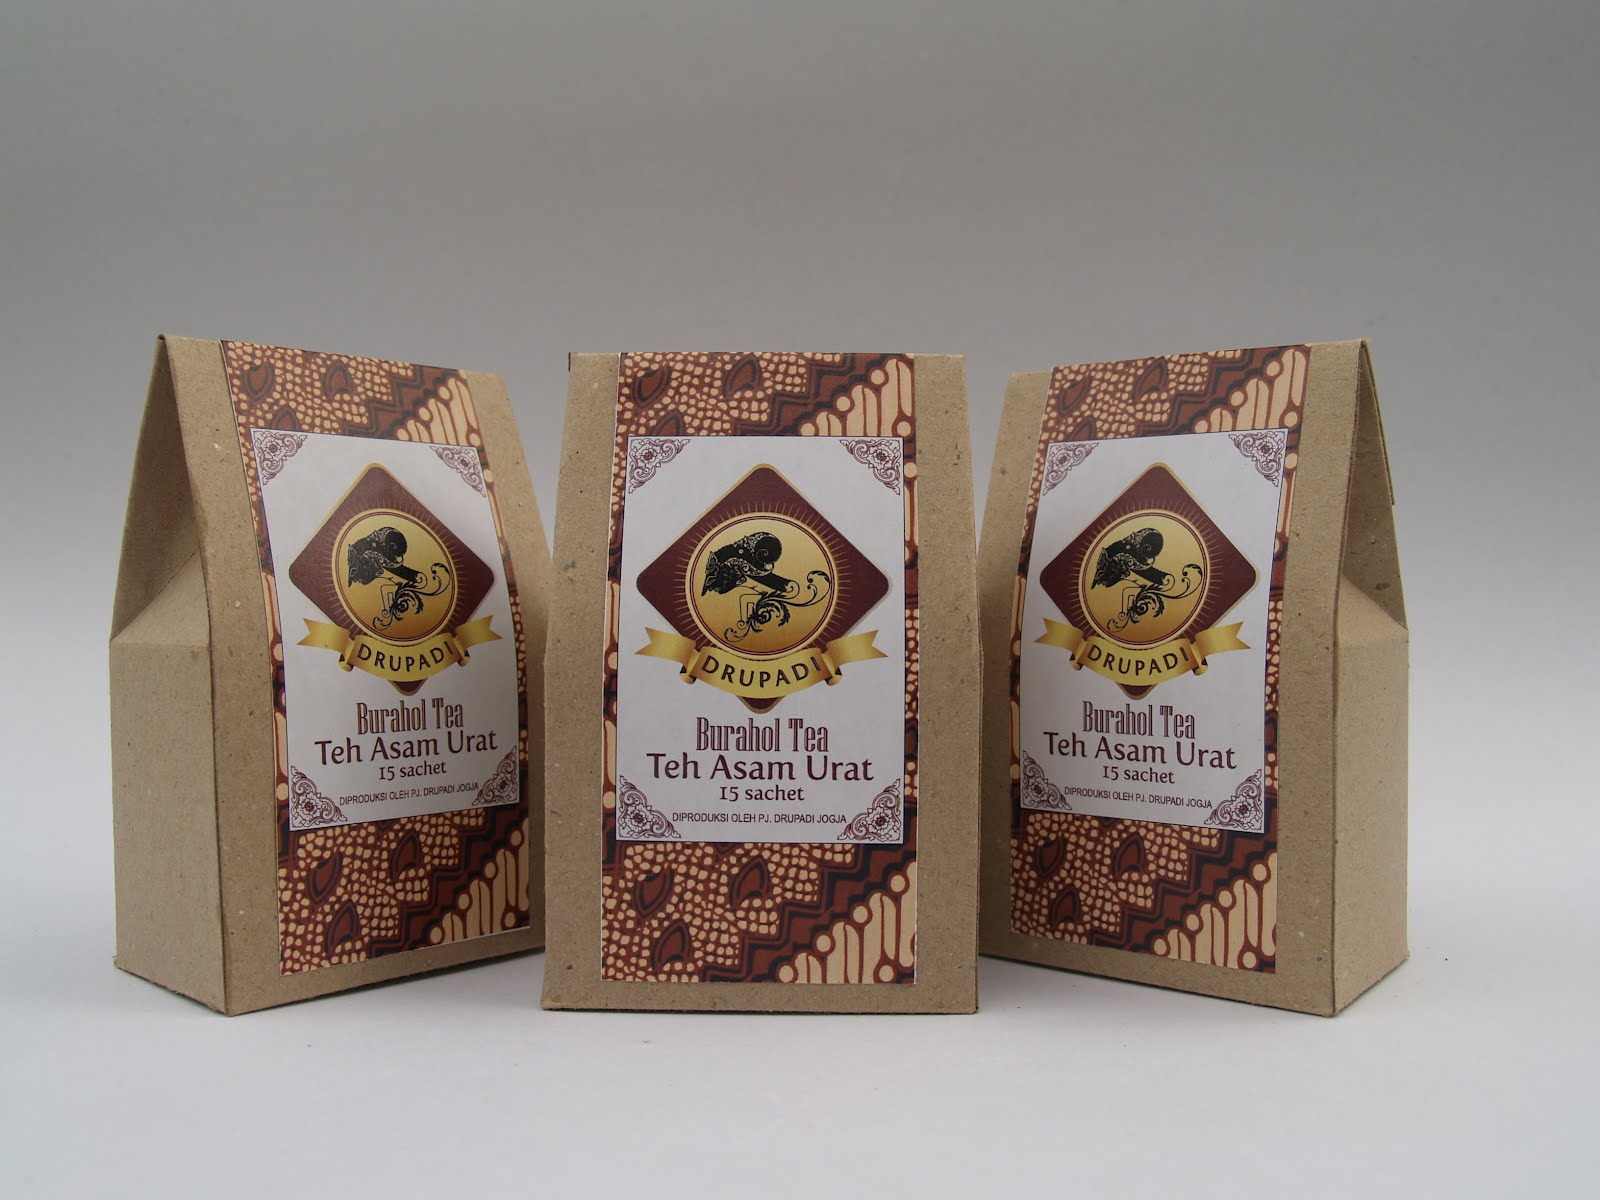 Drupadi Spa Februari 2012 Graviola 100 Concentrate Daun Sirsak Kepel Buah Langka Nan Ajaib Untuk Asam Urat Atau Burahol Termasuk Tanaman Di Indonesia Tumbuhan Ini Biasa Dijumpai Keraton Yang Ada